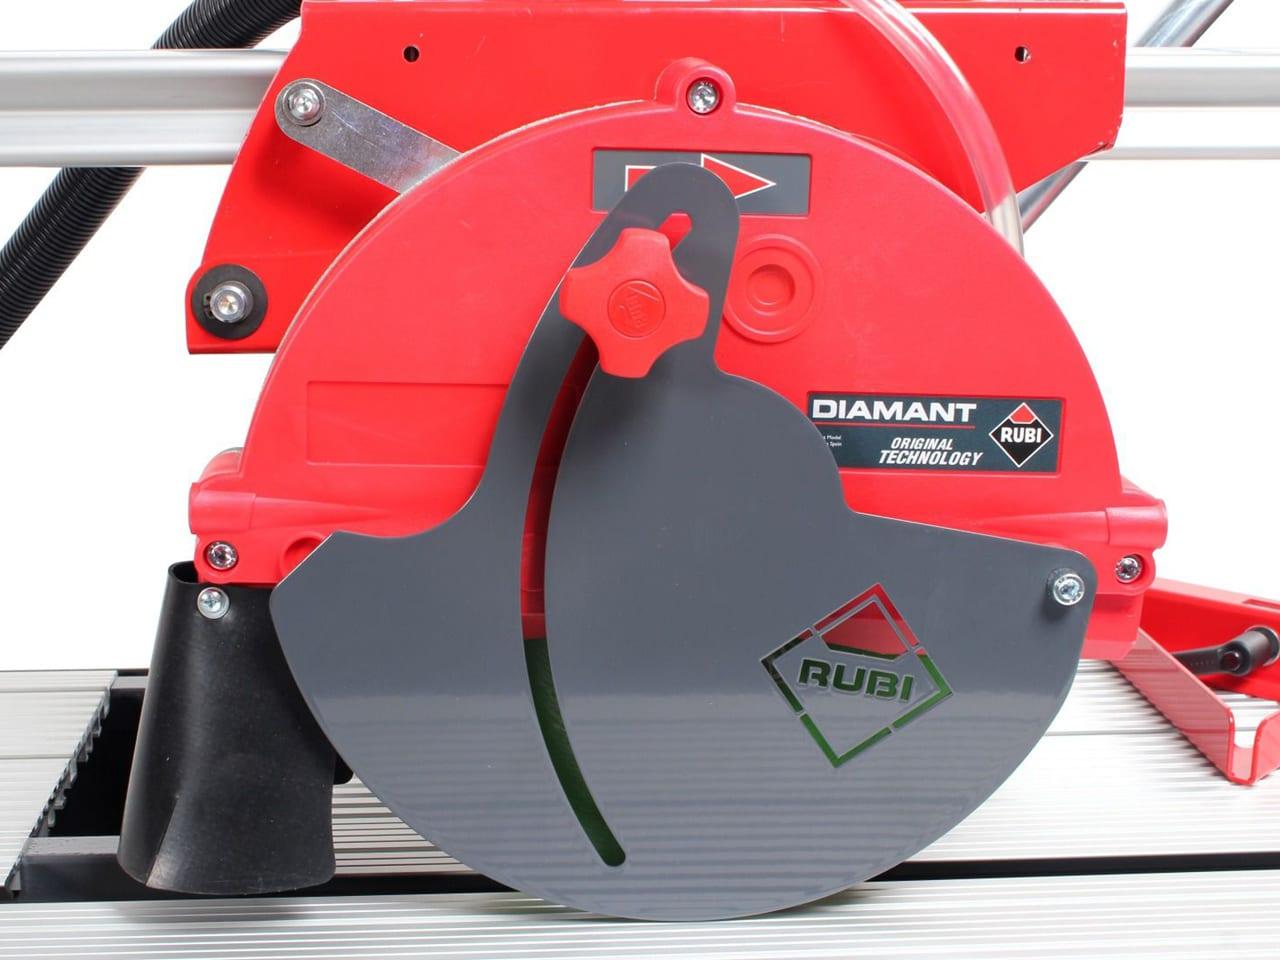 rubi dc 250 1200 wet cut bridge saw electric tile cutter 110v weekly hire